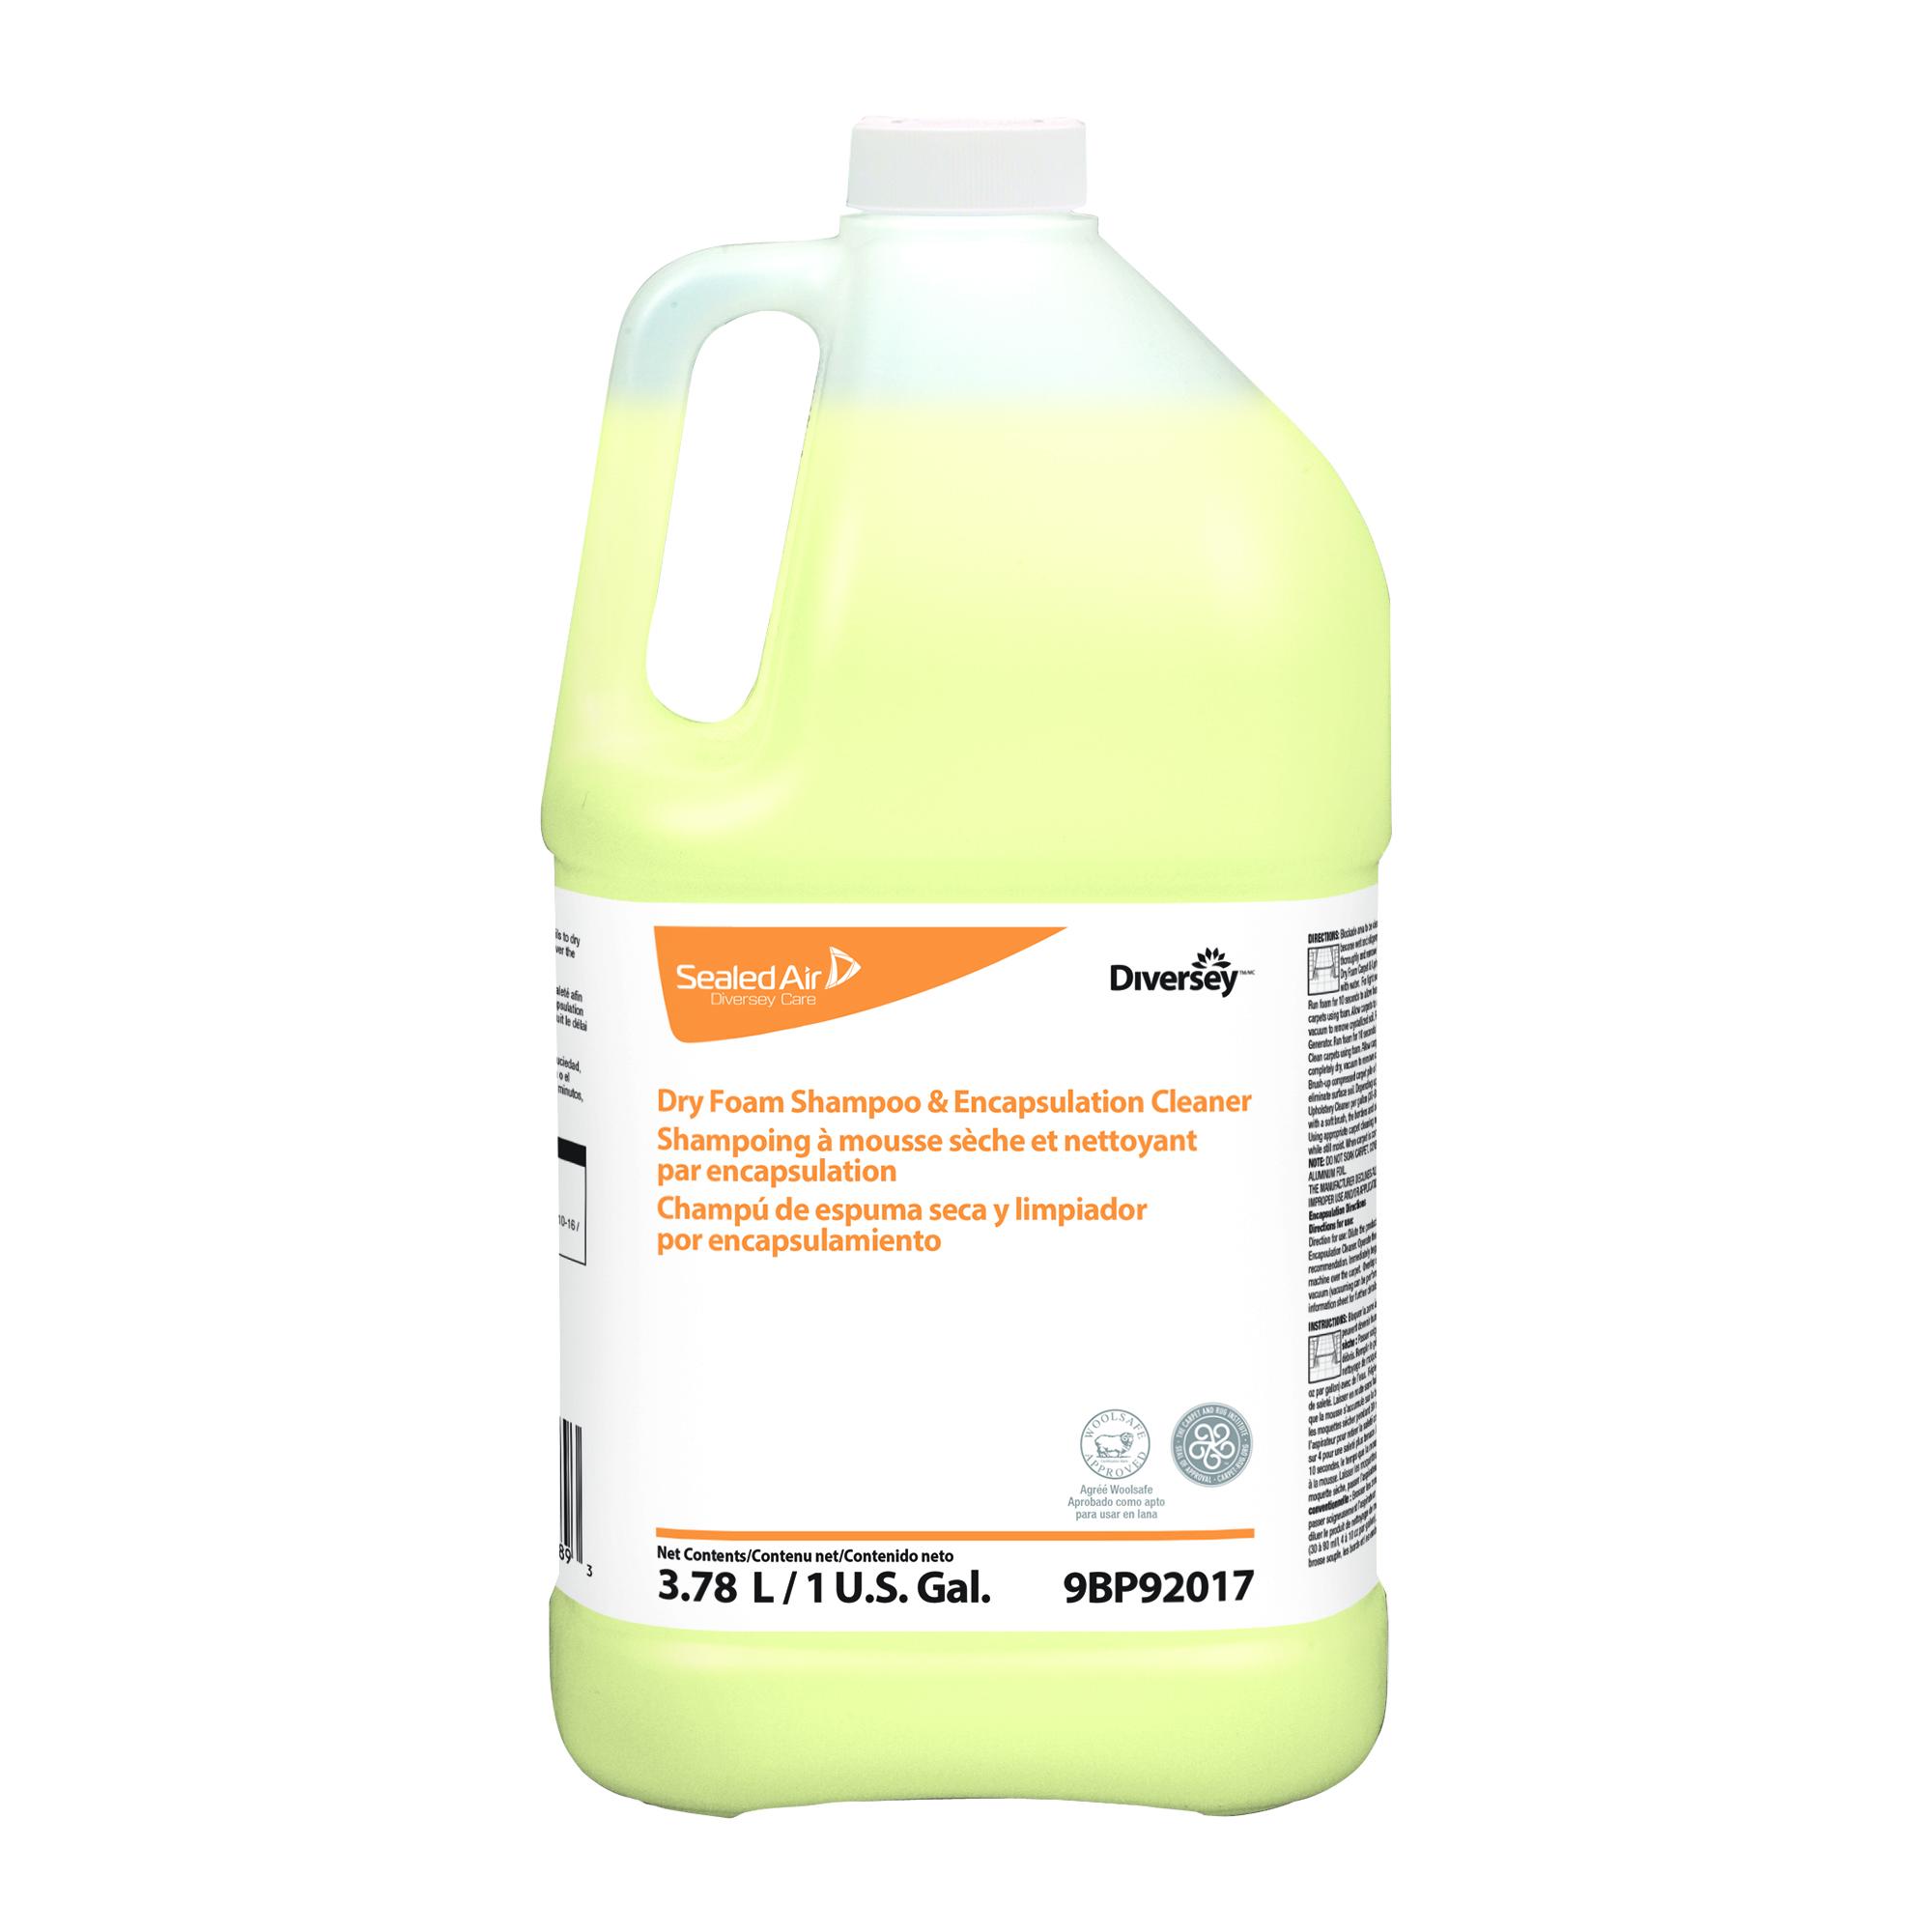 Dry Foam Shampoo Amp Encapsulation Cleaner Diversey